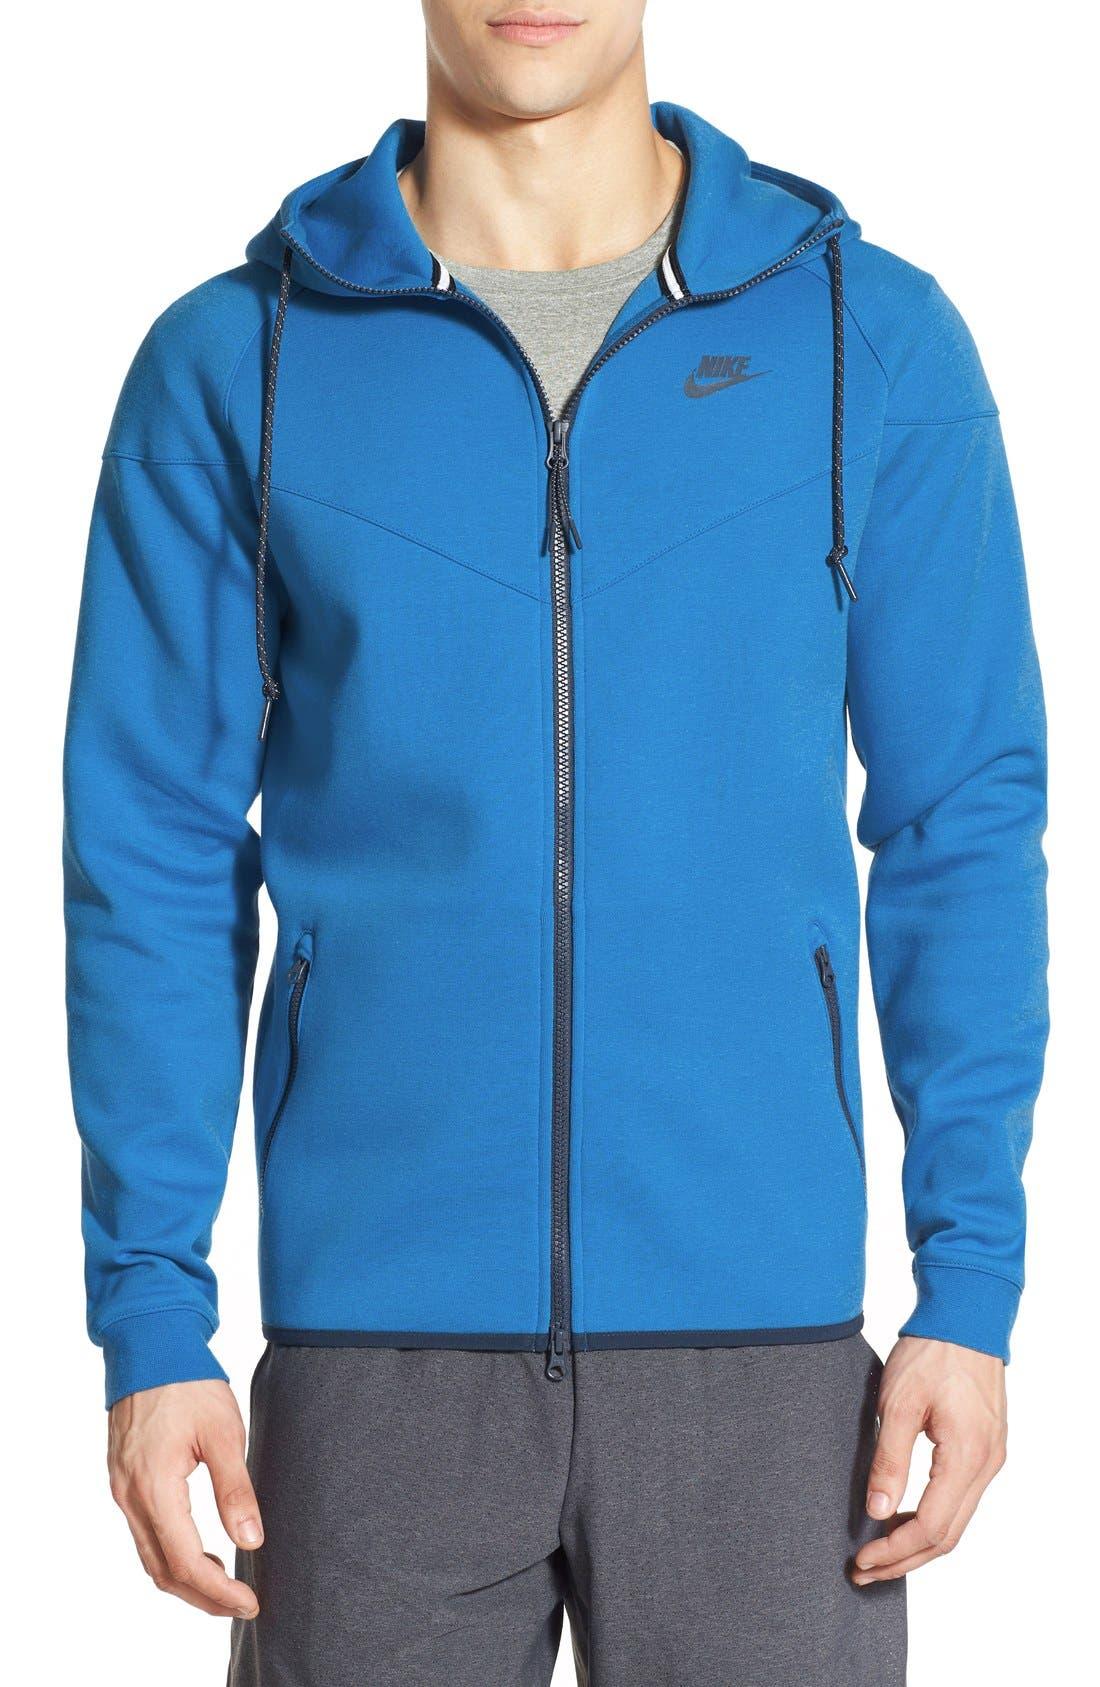 Alternate Image 1 Selected - Nike Water Repellent Tech Fleece Windrunner Jacket